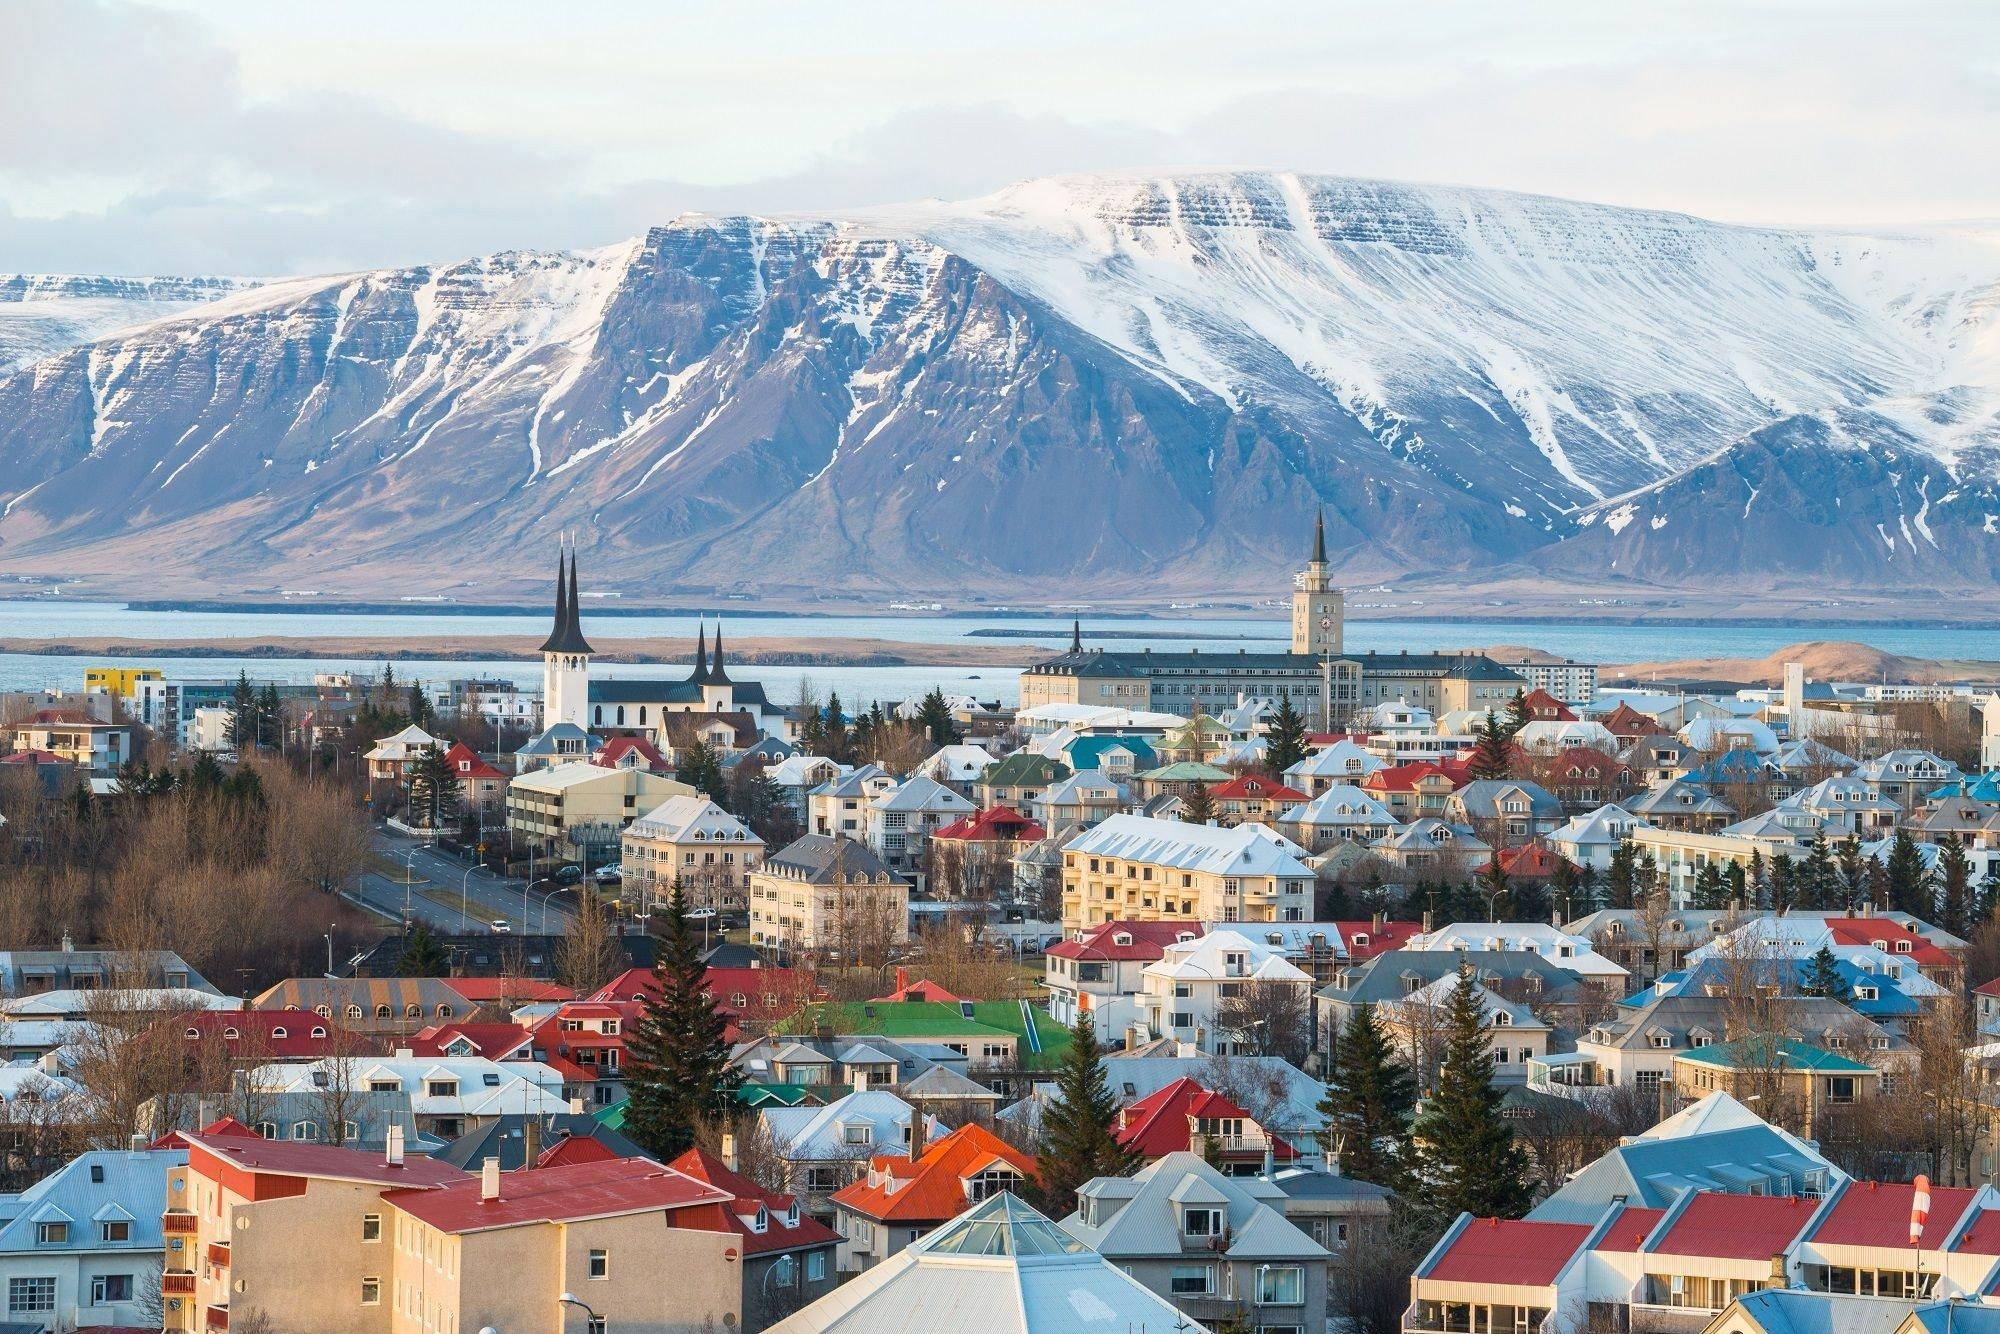 Ontdek in 5 dagen de mooiste plekken in IJsland met hotel in Reykjavik incl. retourvlucht en leuke excursies